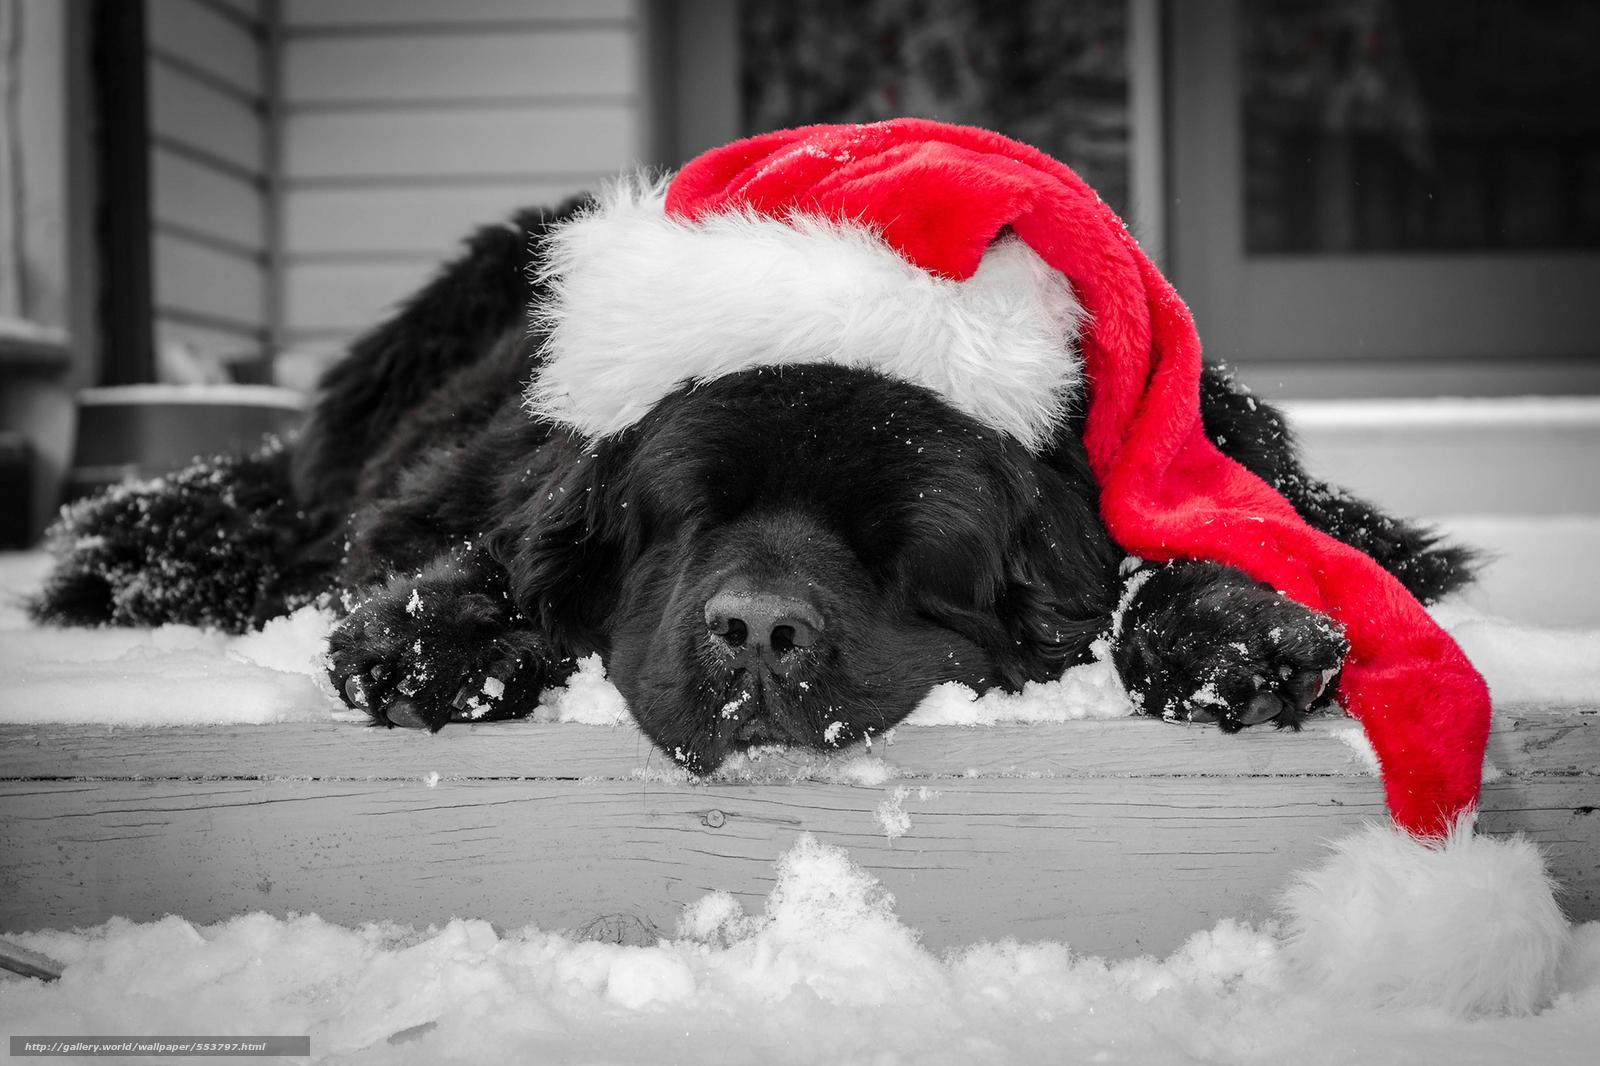 Download wallpaper sleepy, dog, dogs, animal free desktop wallpaper in ...